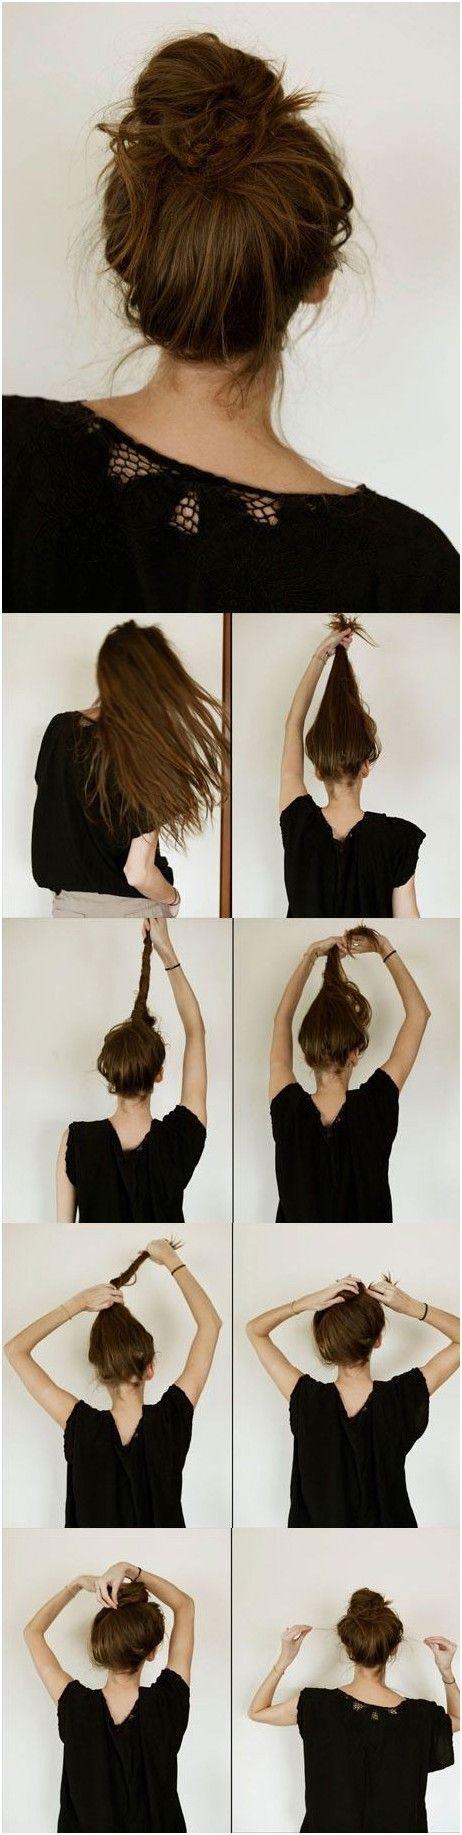 ways to make cute everyday hairstyles long hair tutorials hair